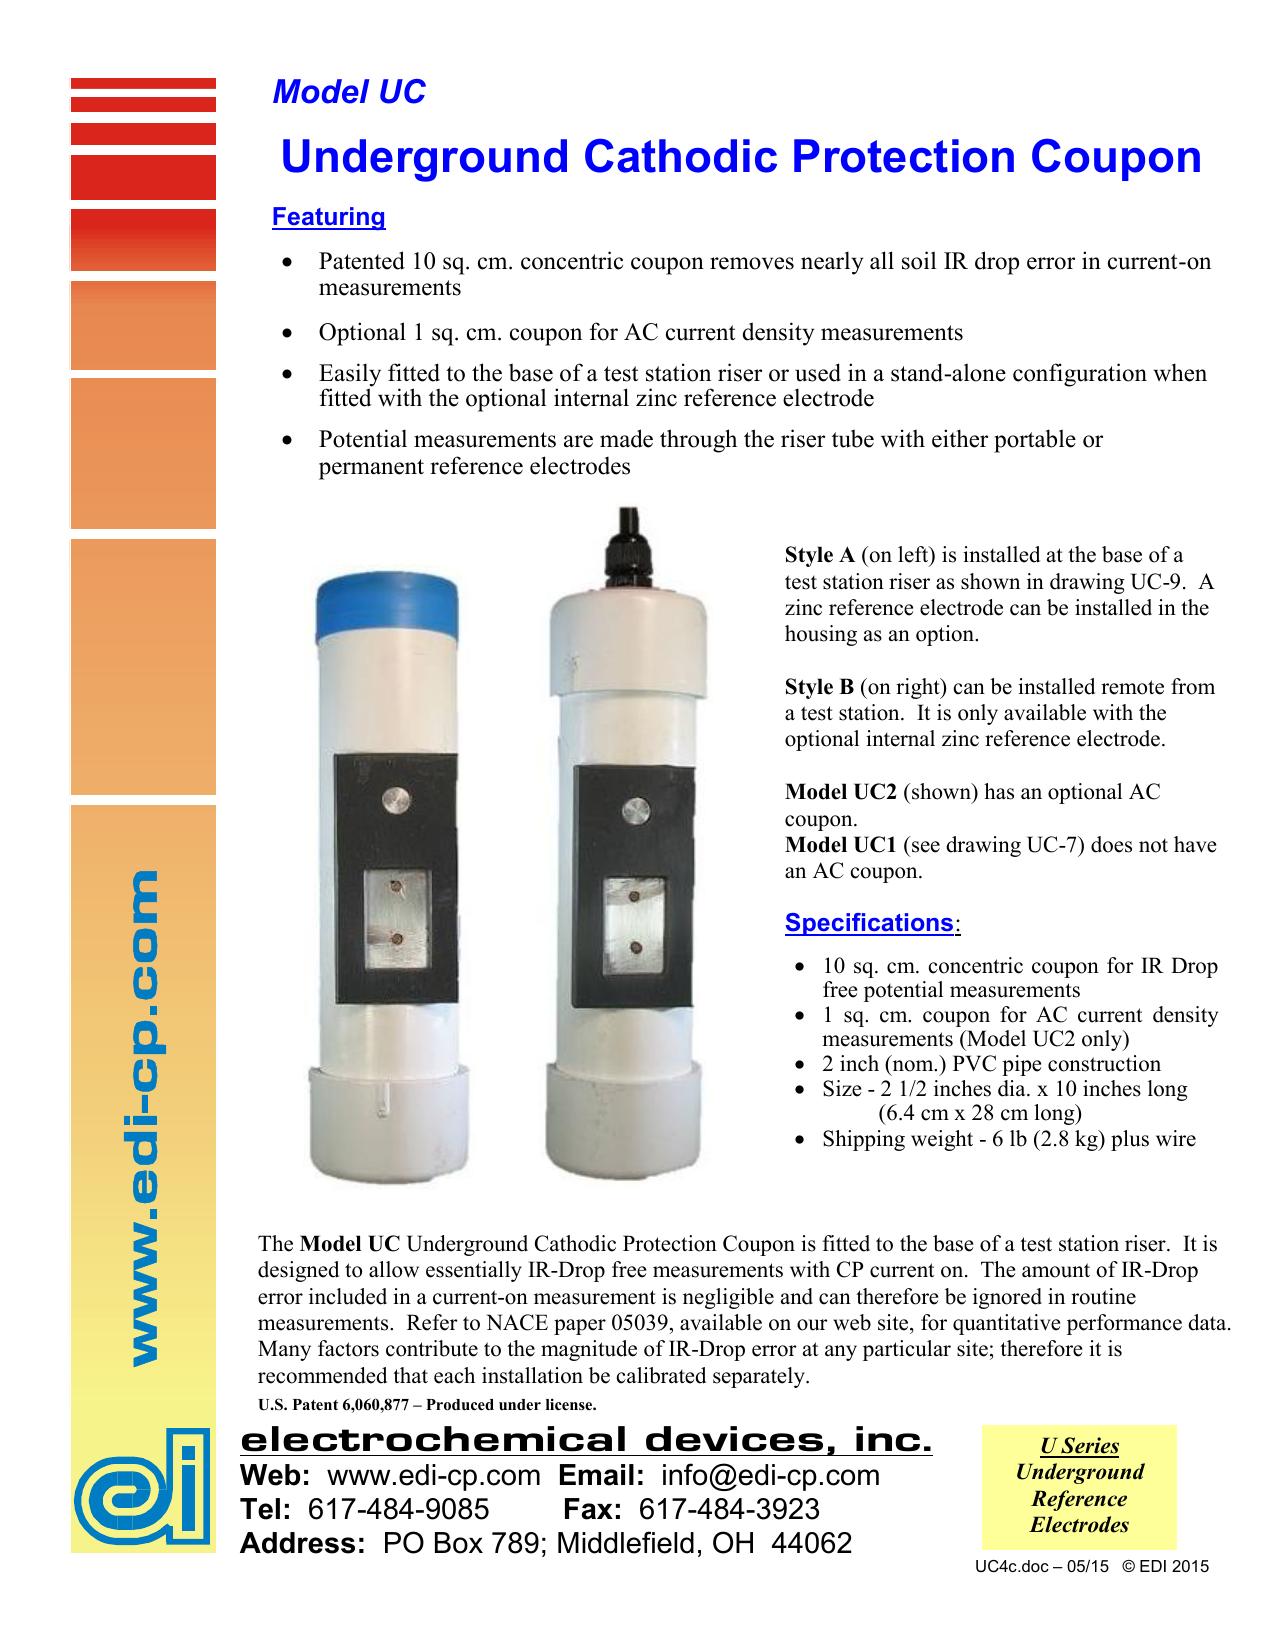 Model UC - Electrochemical Devices, Inc  | manualzz com